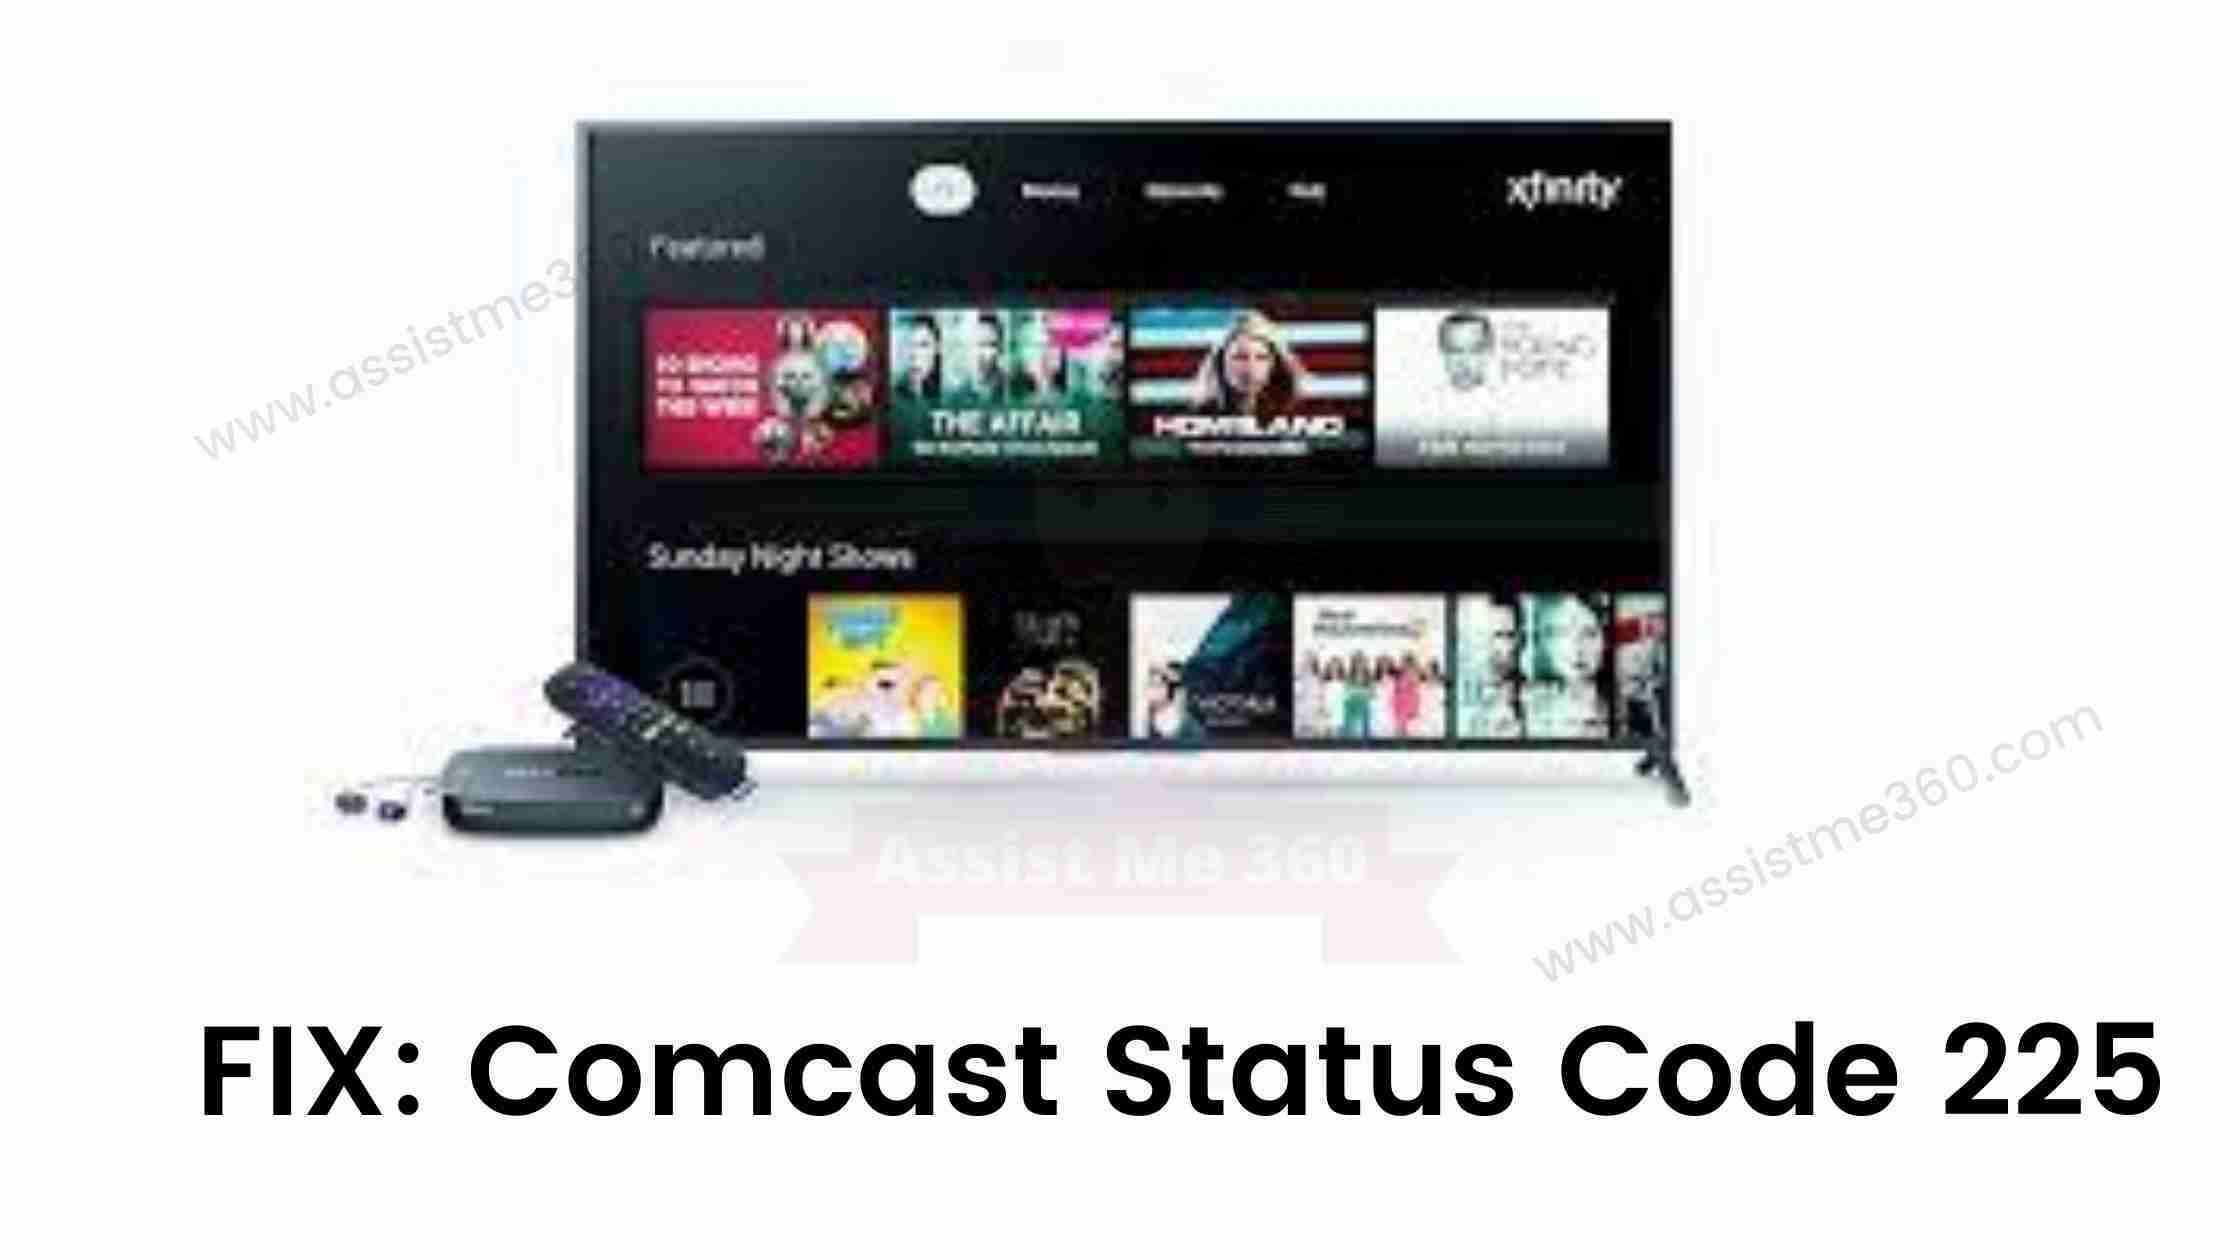 How to fix comcast status code 225